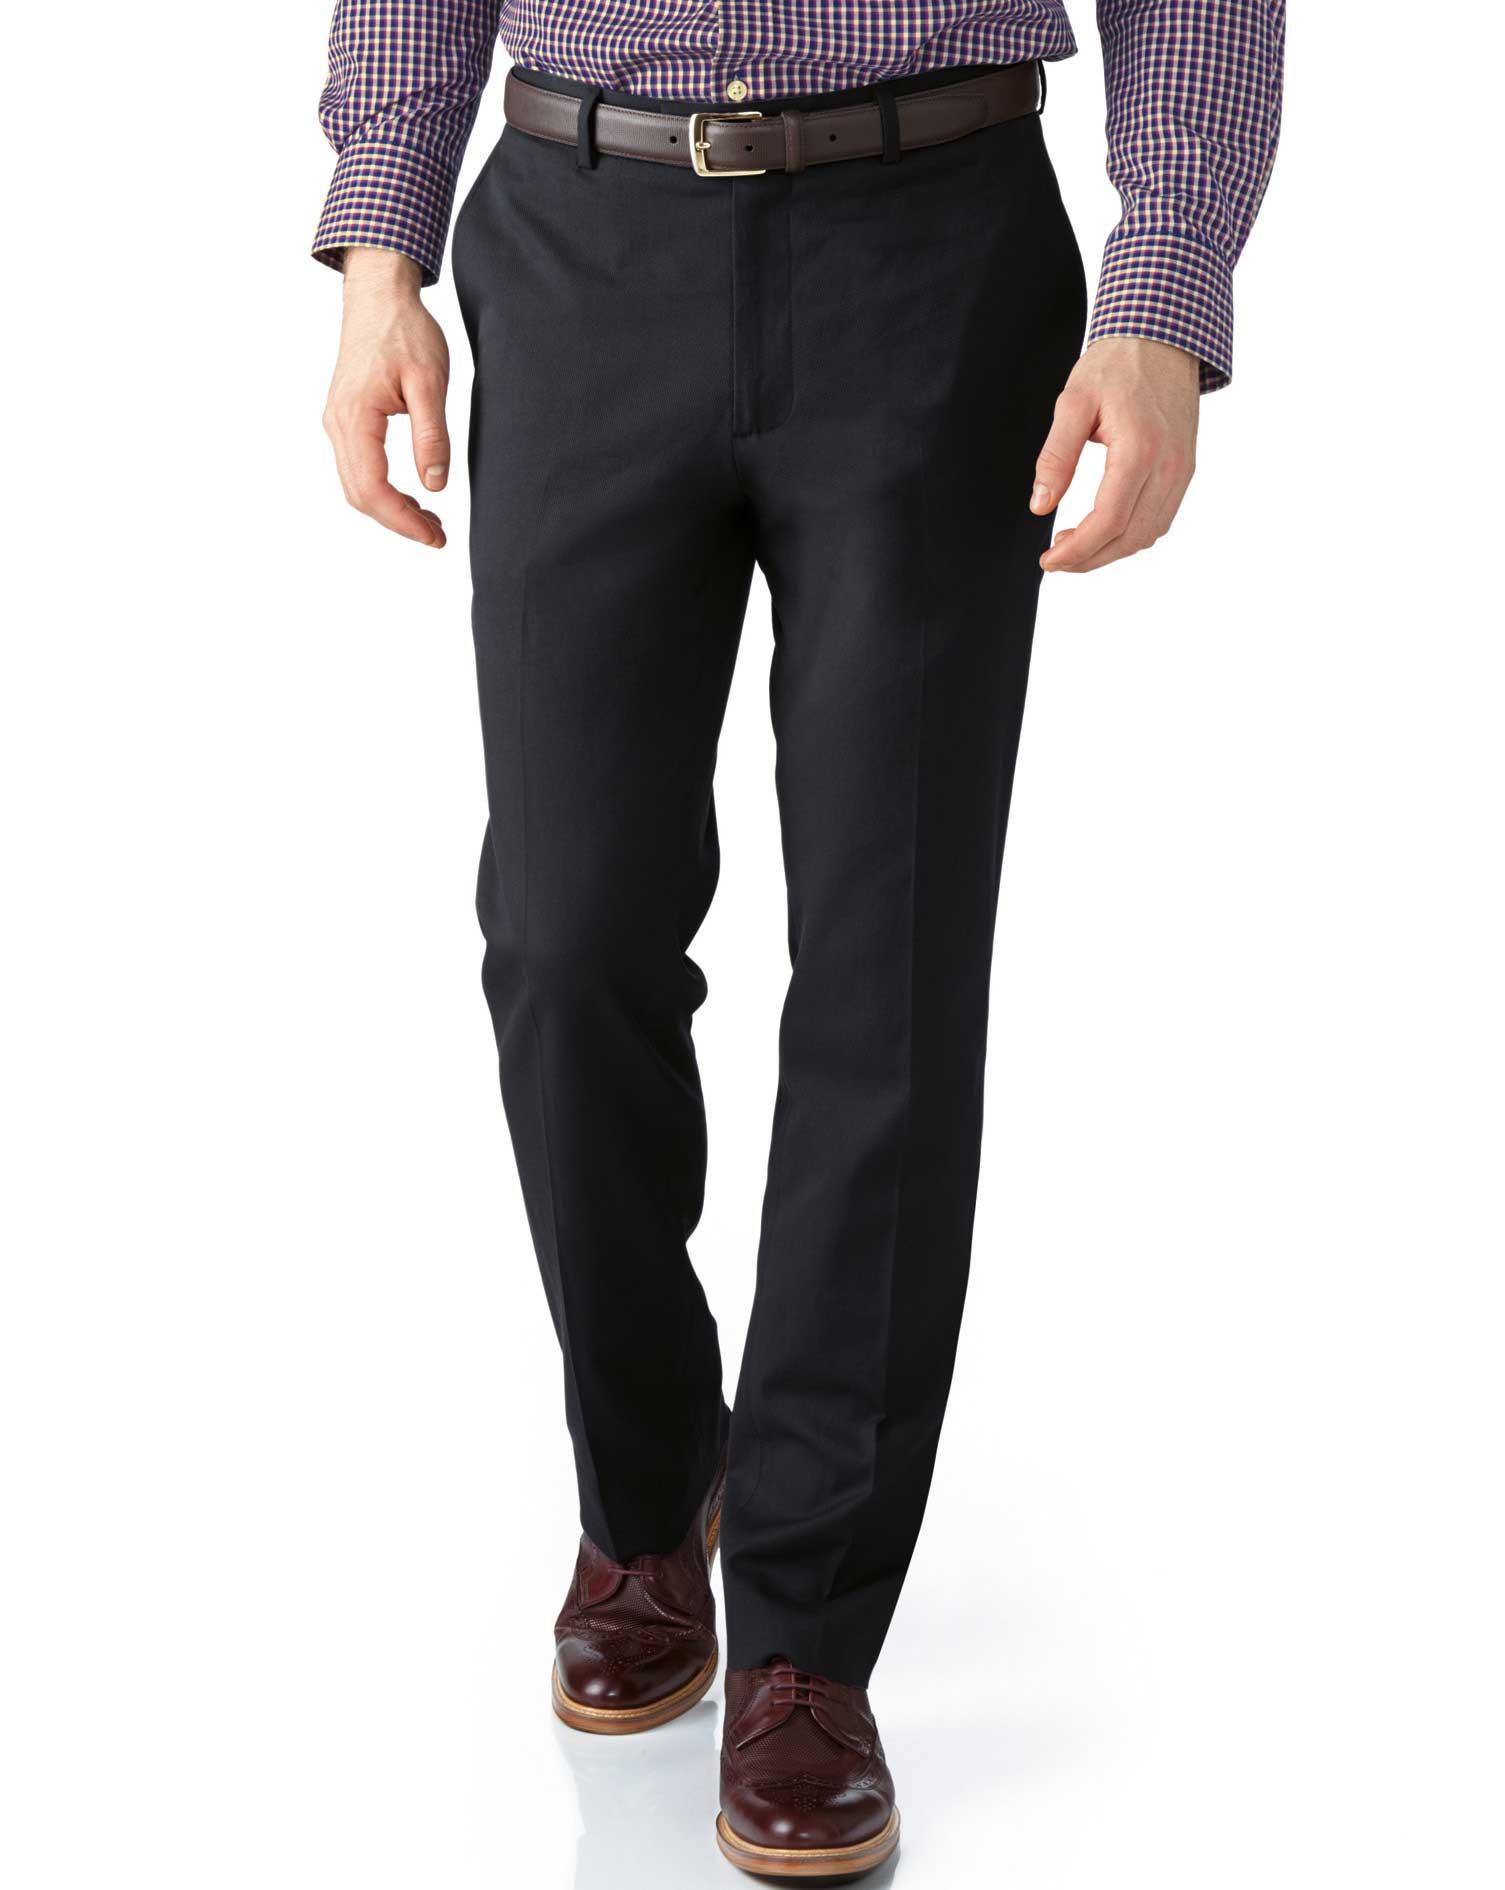 Grey Extra Slim Fit Stretch Cavalry Twill Trousers Size W36 L30 by Charles Tyrwhitt